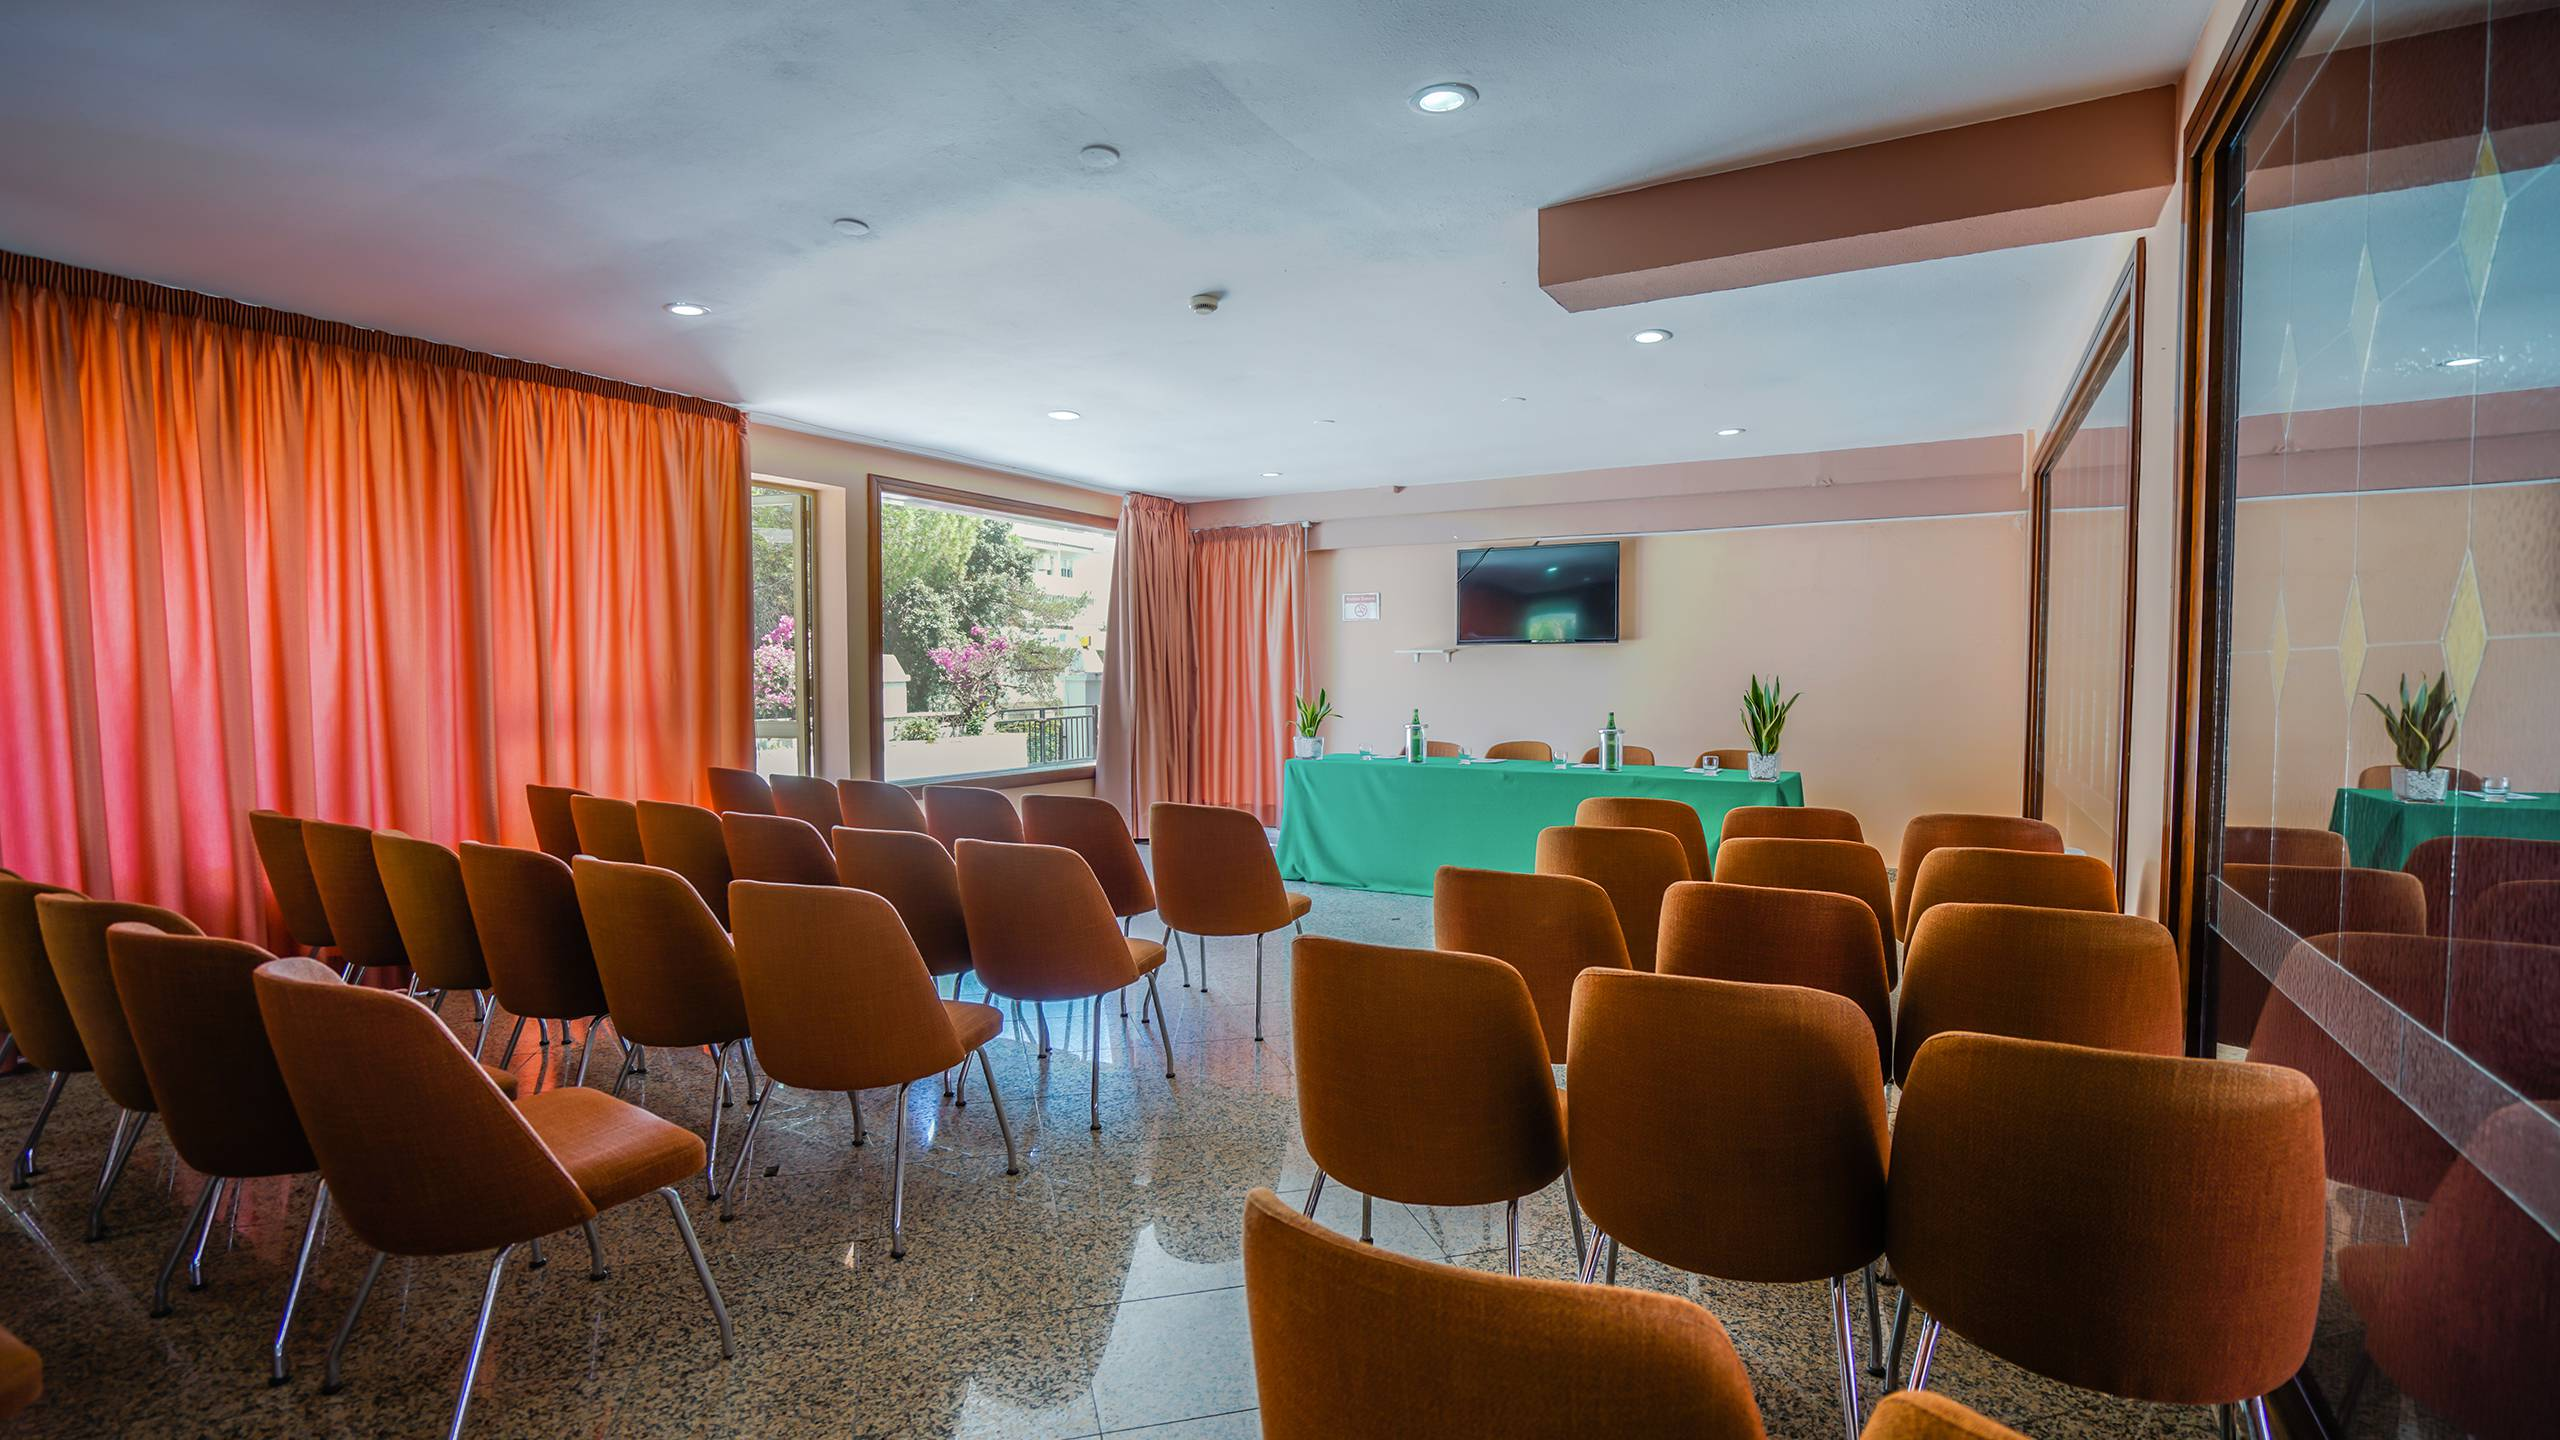 Santa-Caterina-Village-Scalea-Konferenzraum(3)-3-DSC02120